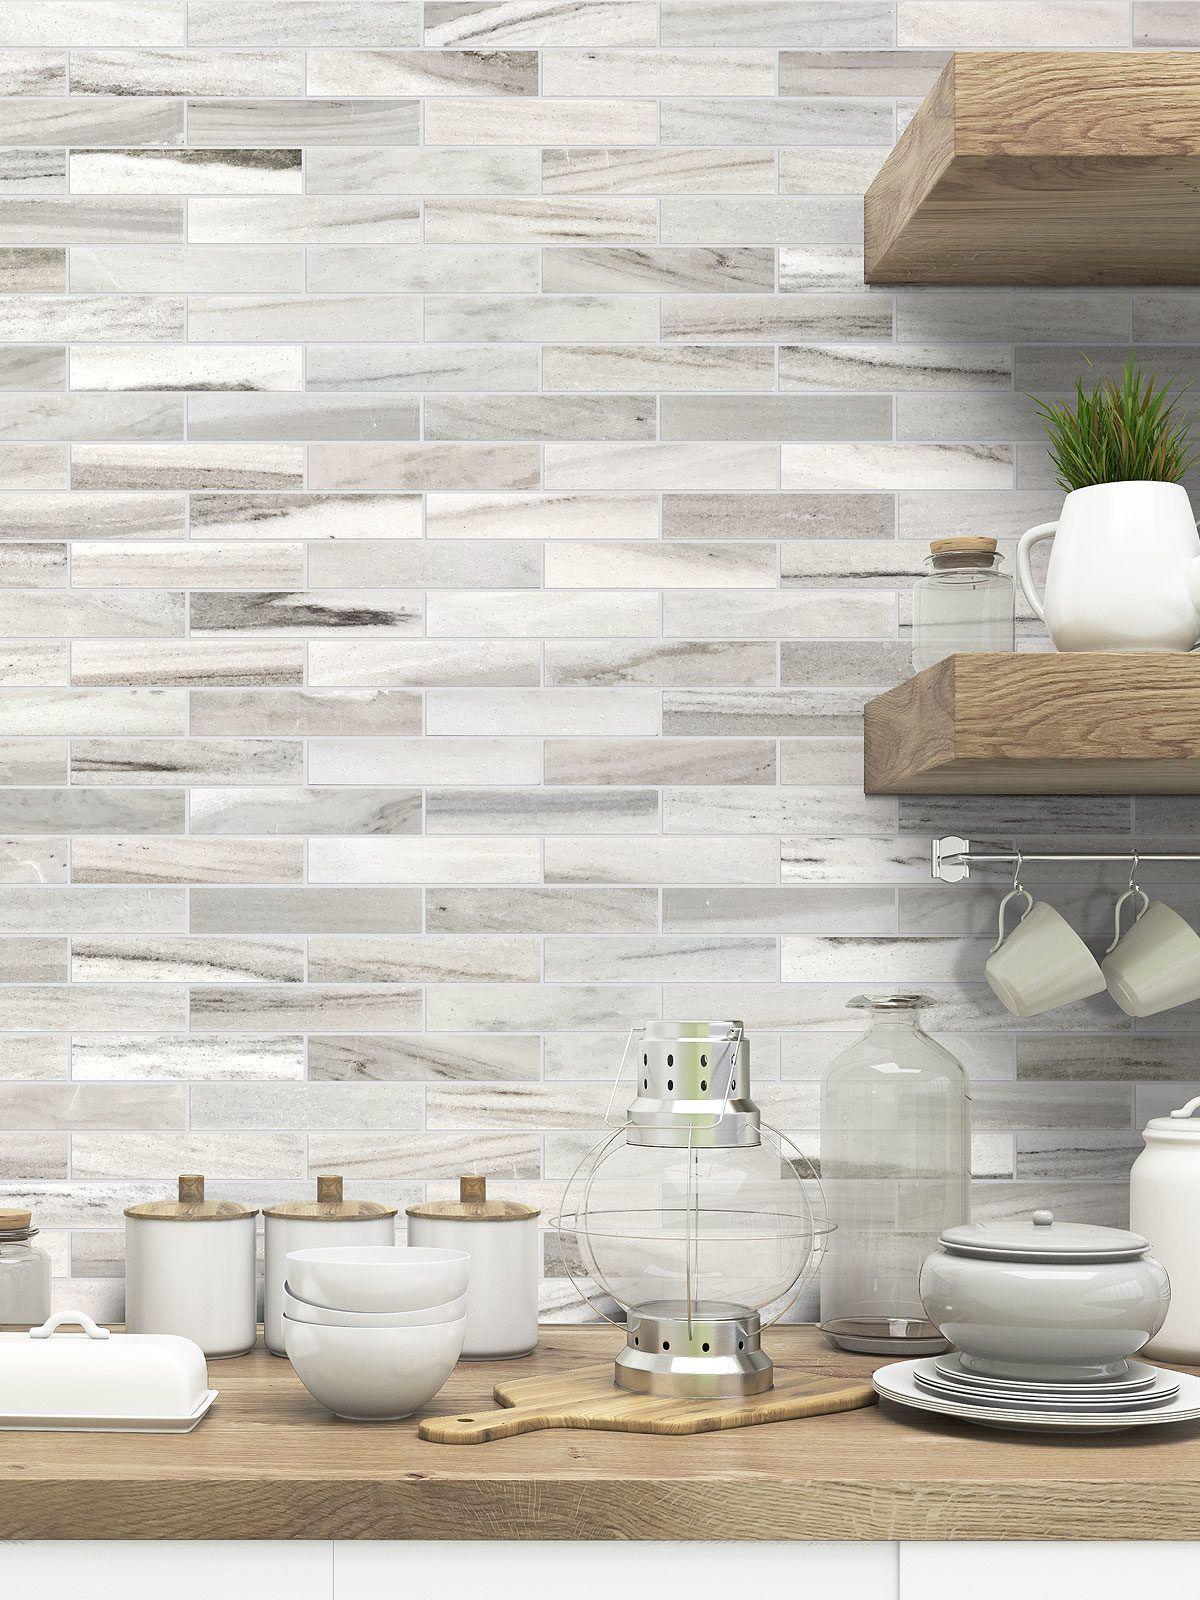 Modern White Gray Subway Marble Backsplash Tile Kitchen Tiles Backsplash Kitchen Backsplash Designs White Tile Backsplash